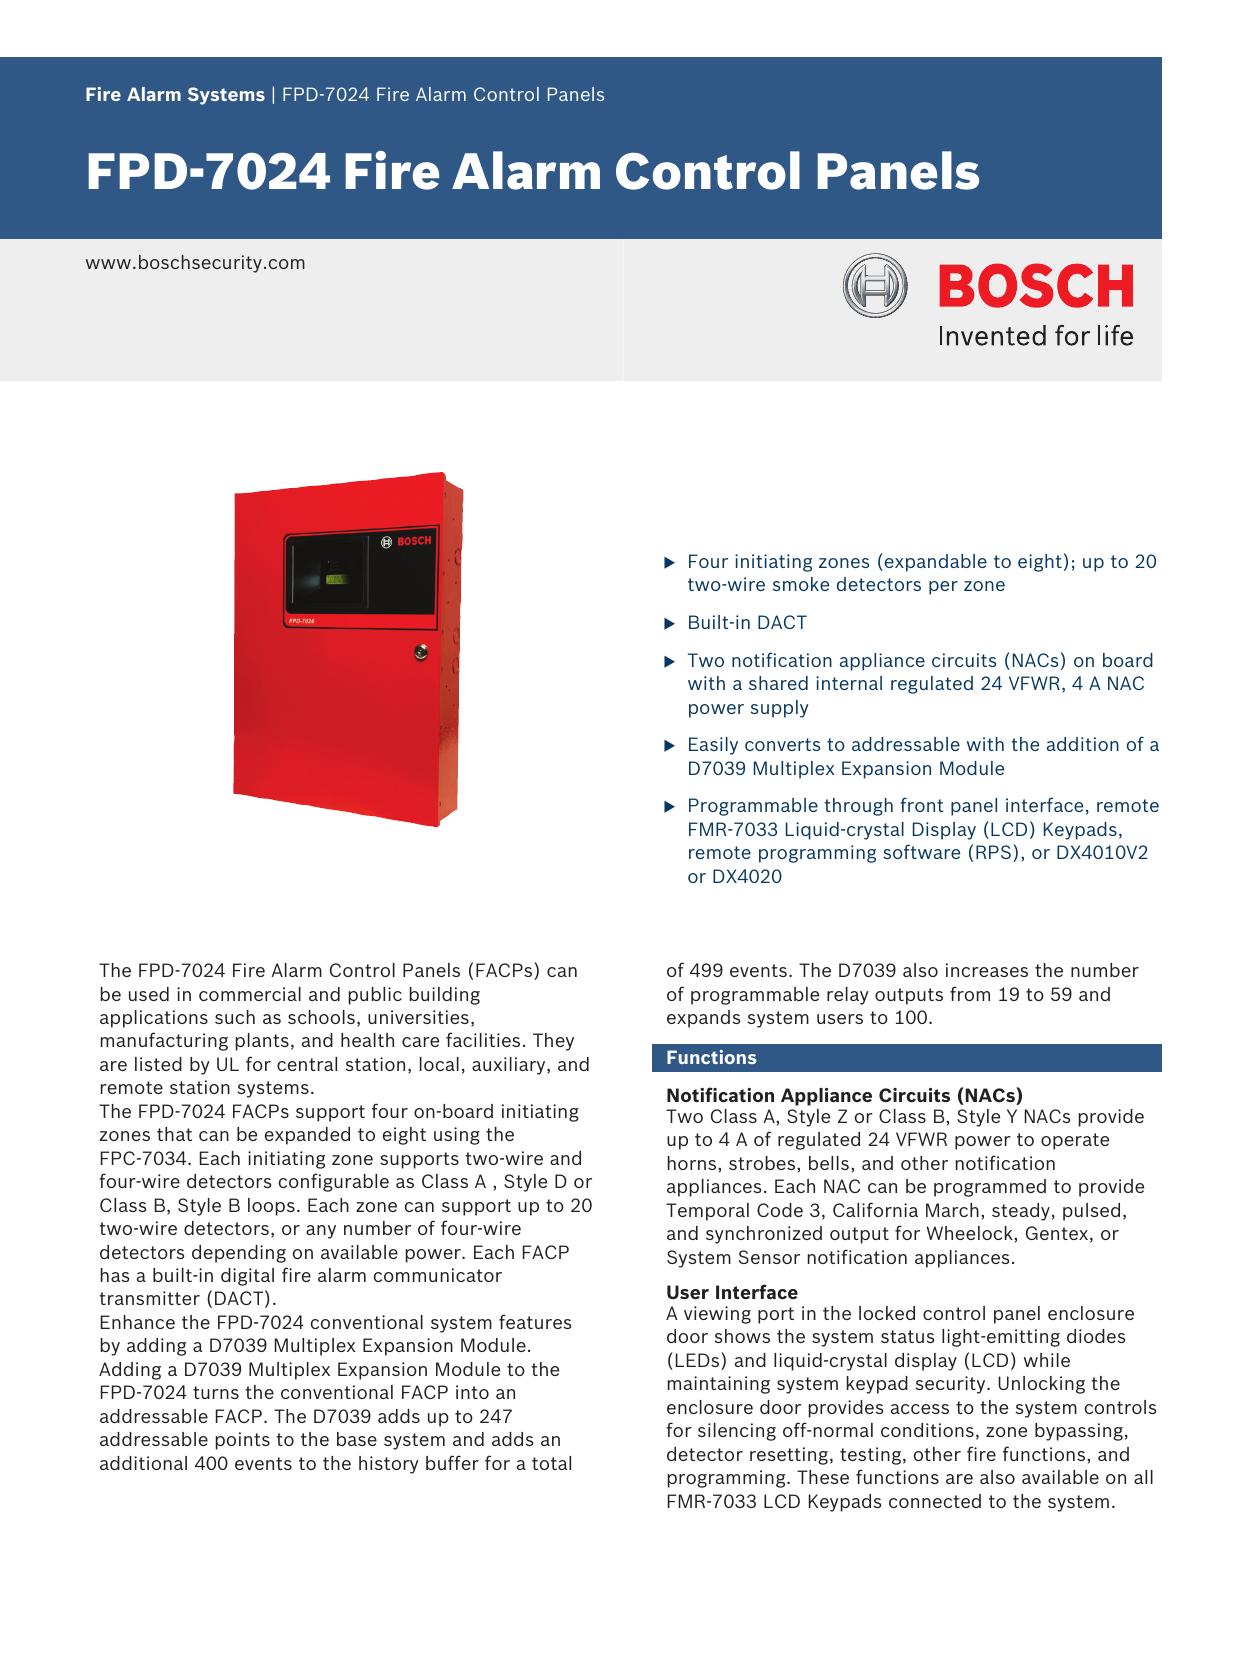 Bosch Appliances Smoke Alarm Fpd 7024 User Manual Manualzz